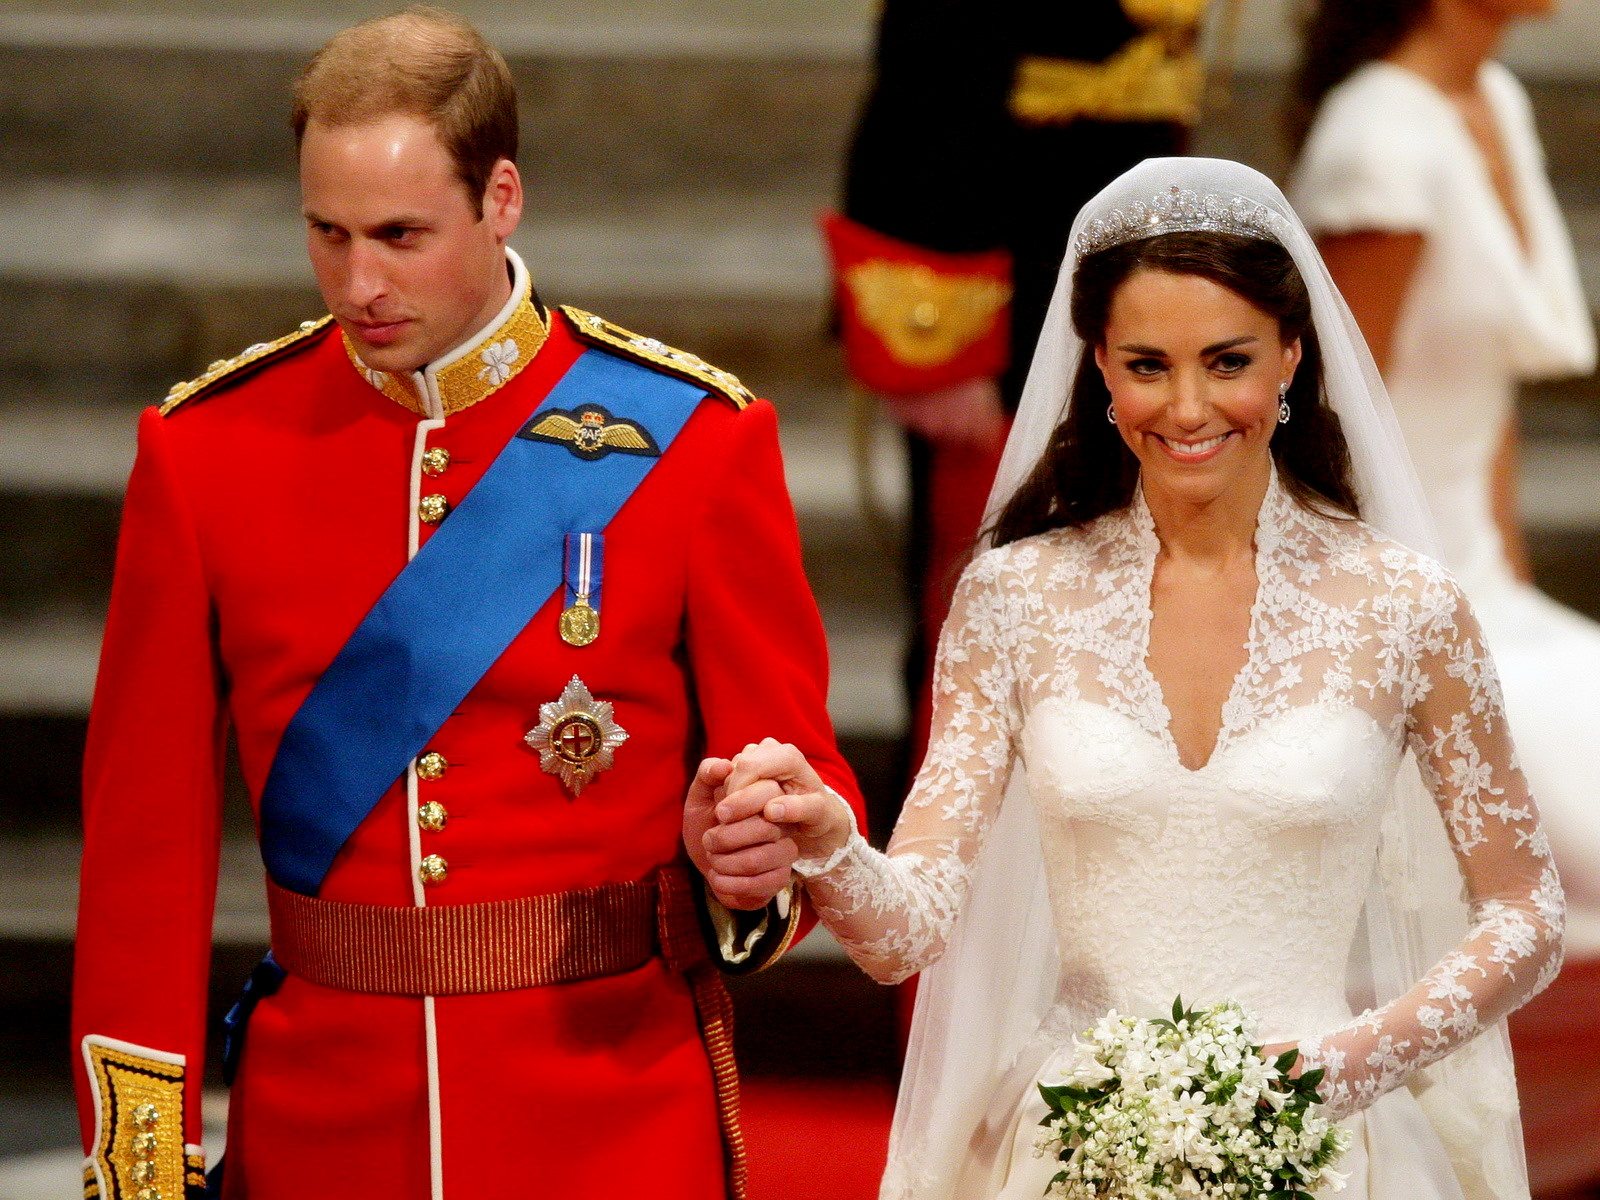 https://i1.wp.com/images6.fanpop.com/image/photos/33100000/Wills-Kate-prince-william-and-kate-middleton-33166687-1600-1200.jpg